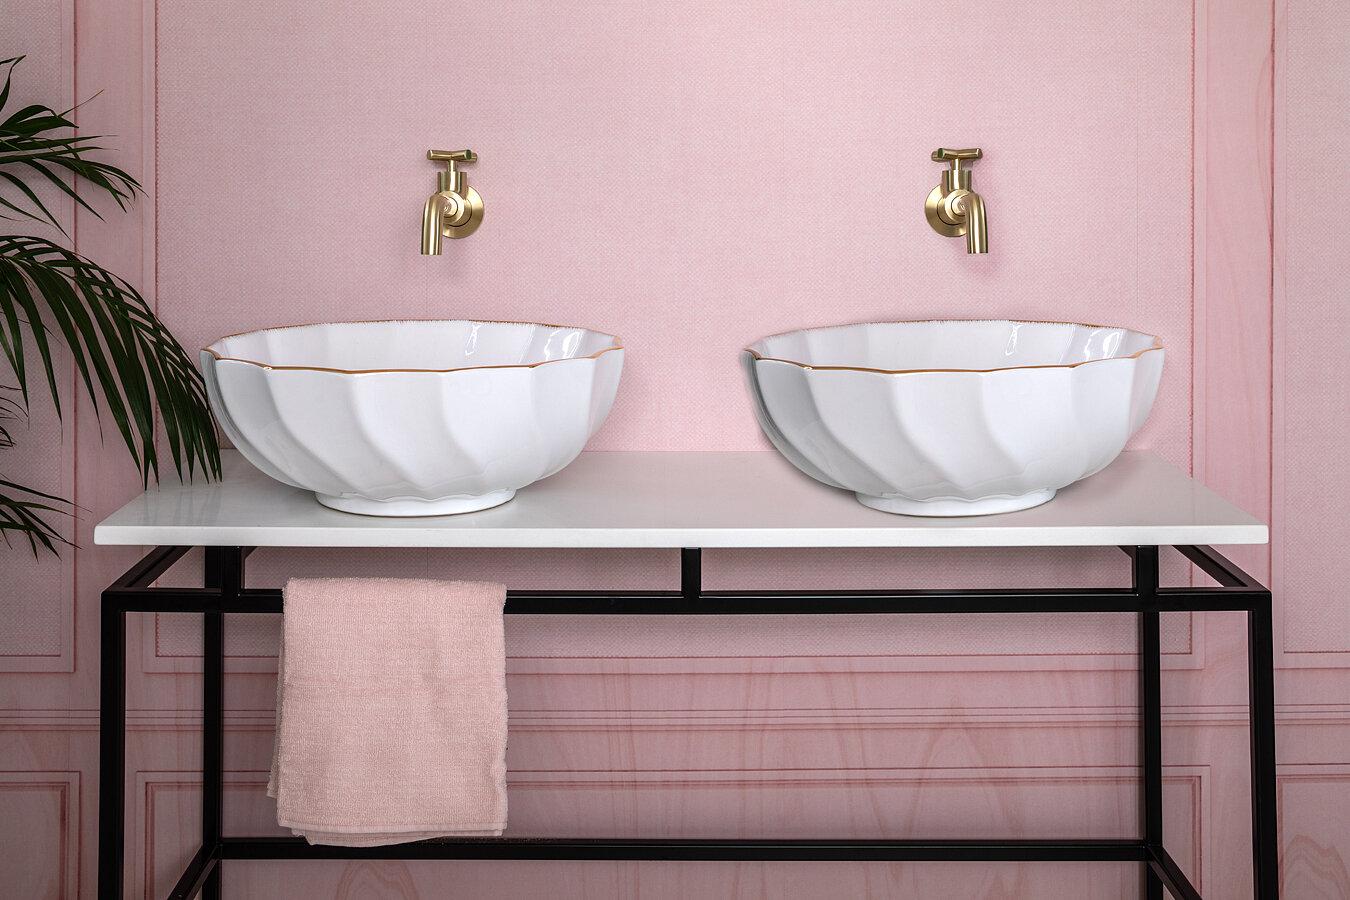 London Basin Company Basin Sink Countertop Vanity Unit Accessories